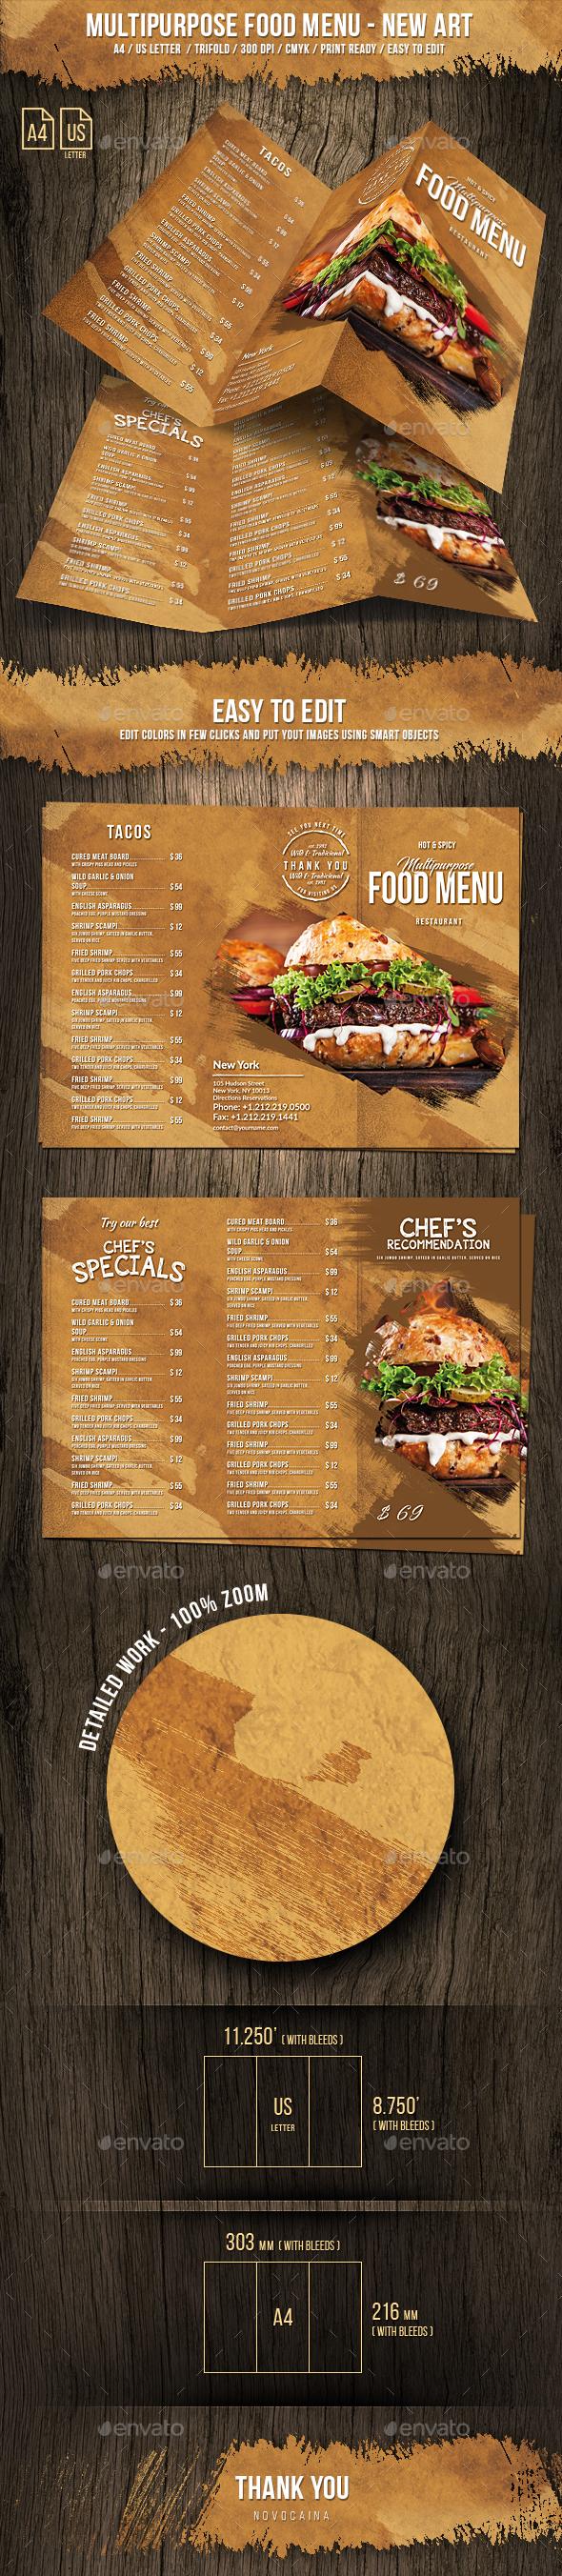 Multipurpose Food Menu - A4 & US Letter - Trifold - New Art - Food Menus Print Templates